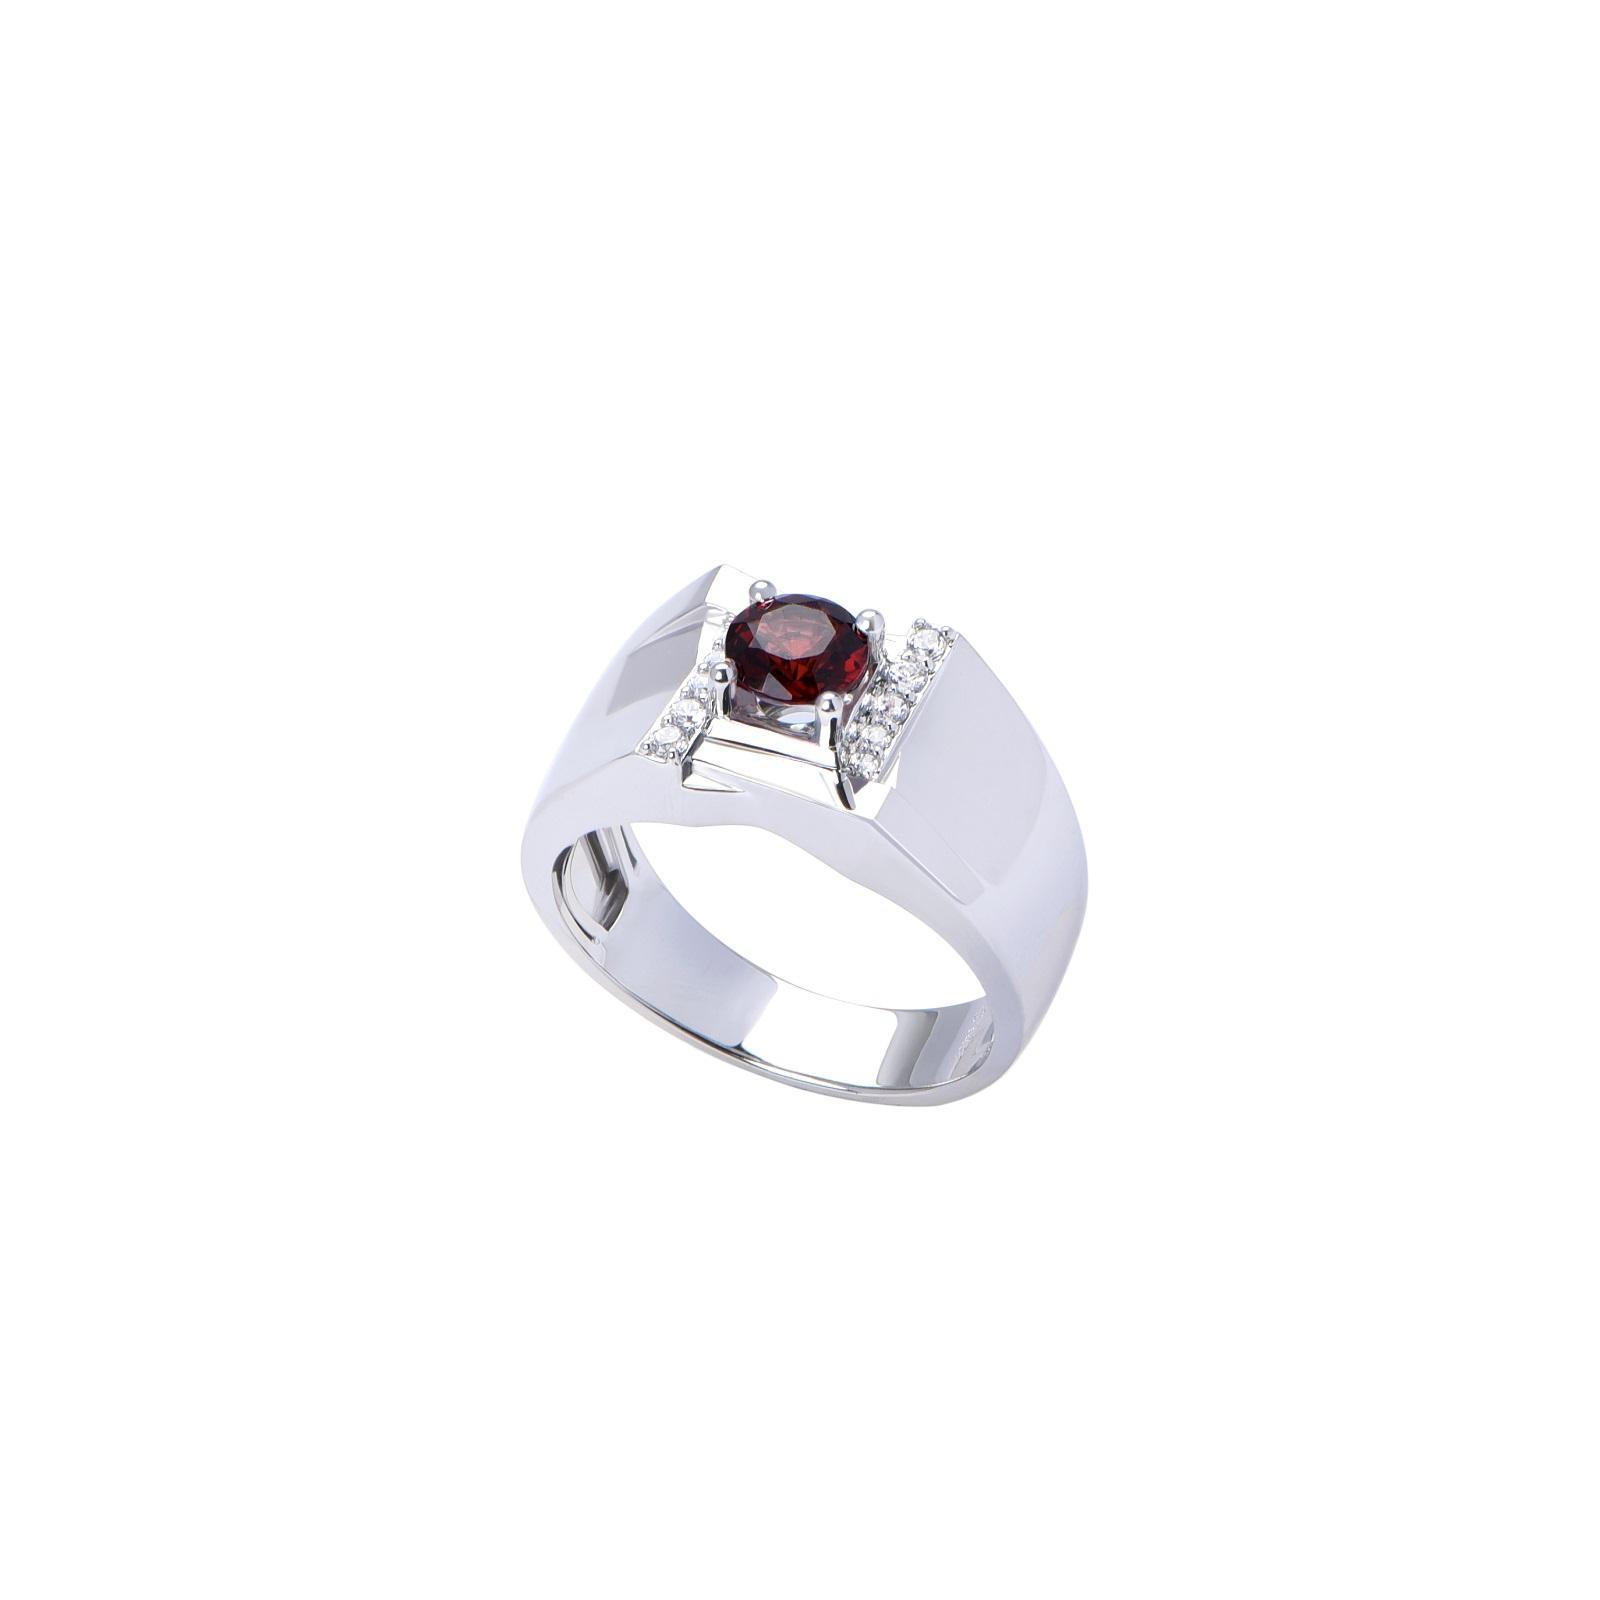 Nhẫn nam đá Garnet 21NN001